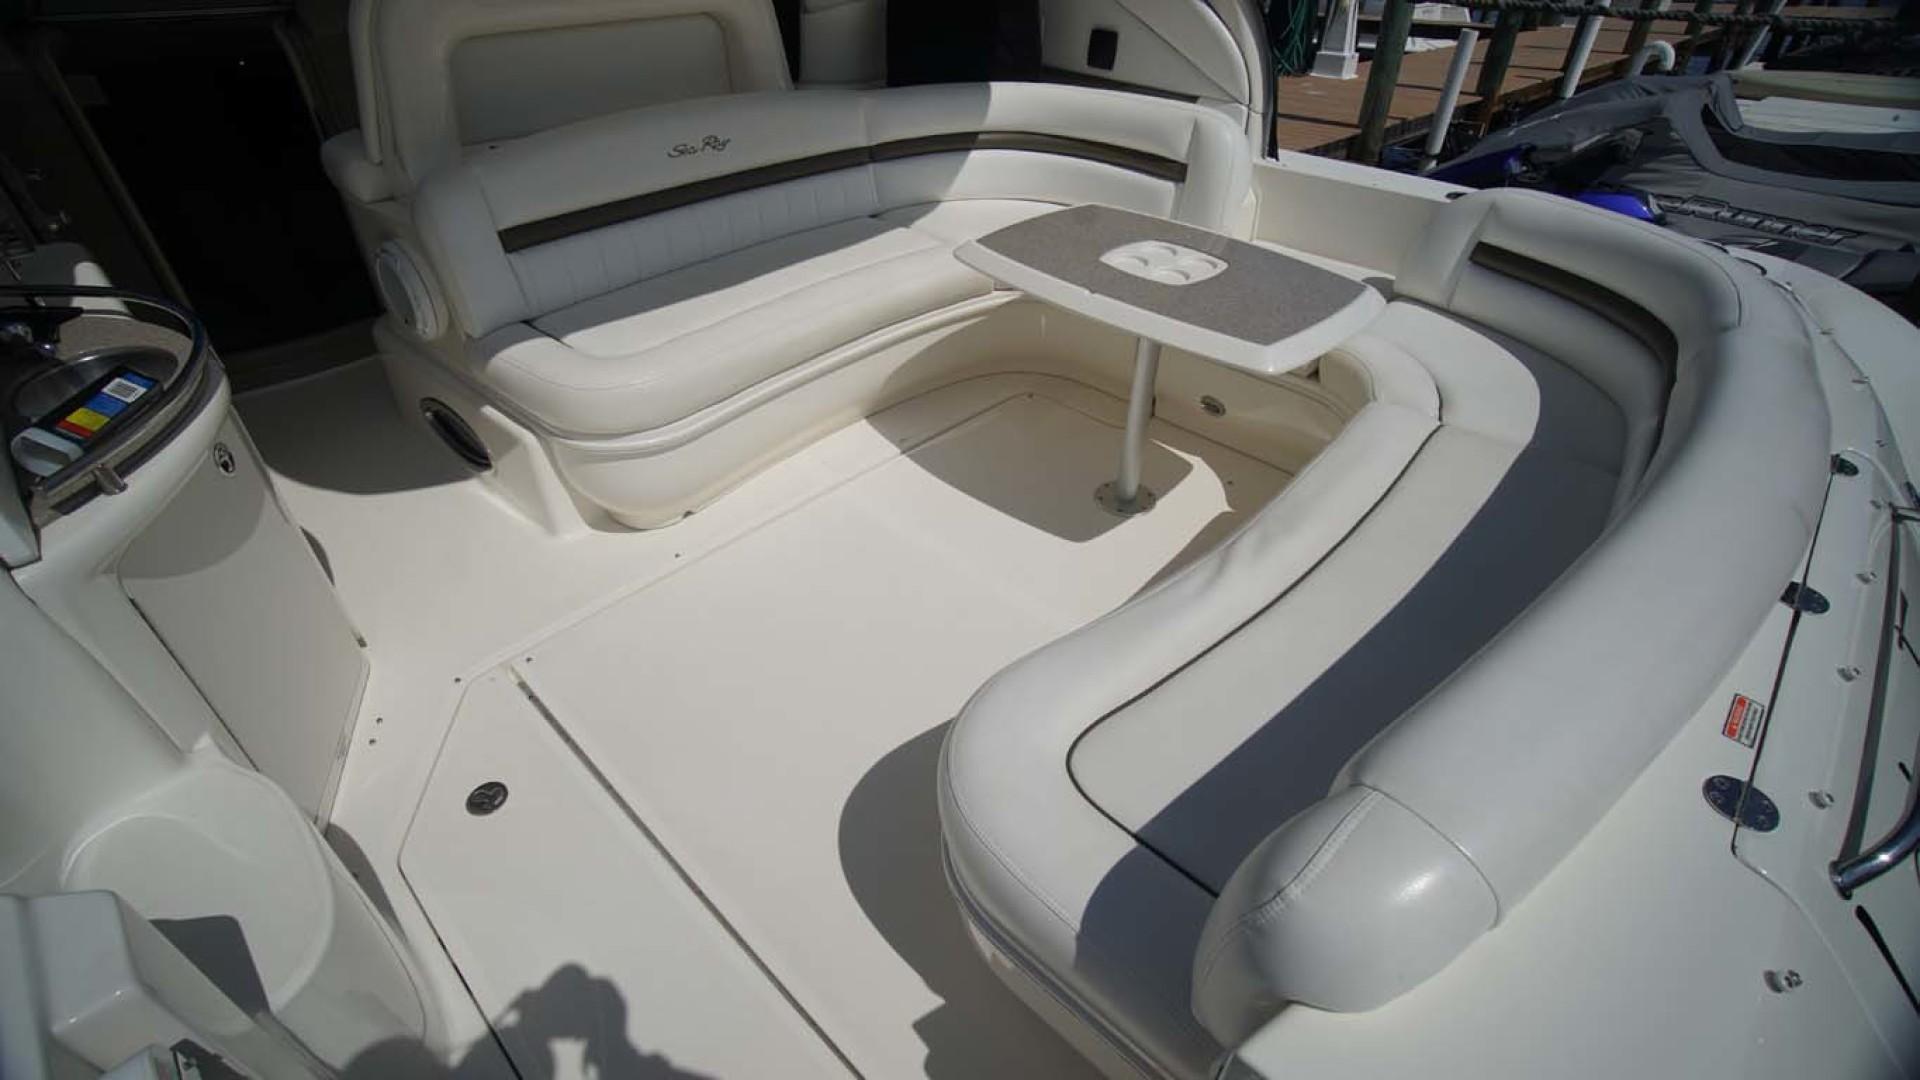 Sea Ray-Sundancer 2006-Late Fee Destin-Florida-United States-Cockpit-1125982 | Thumbnail